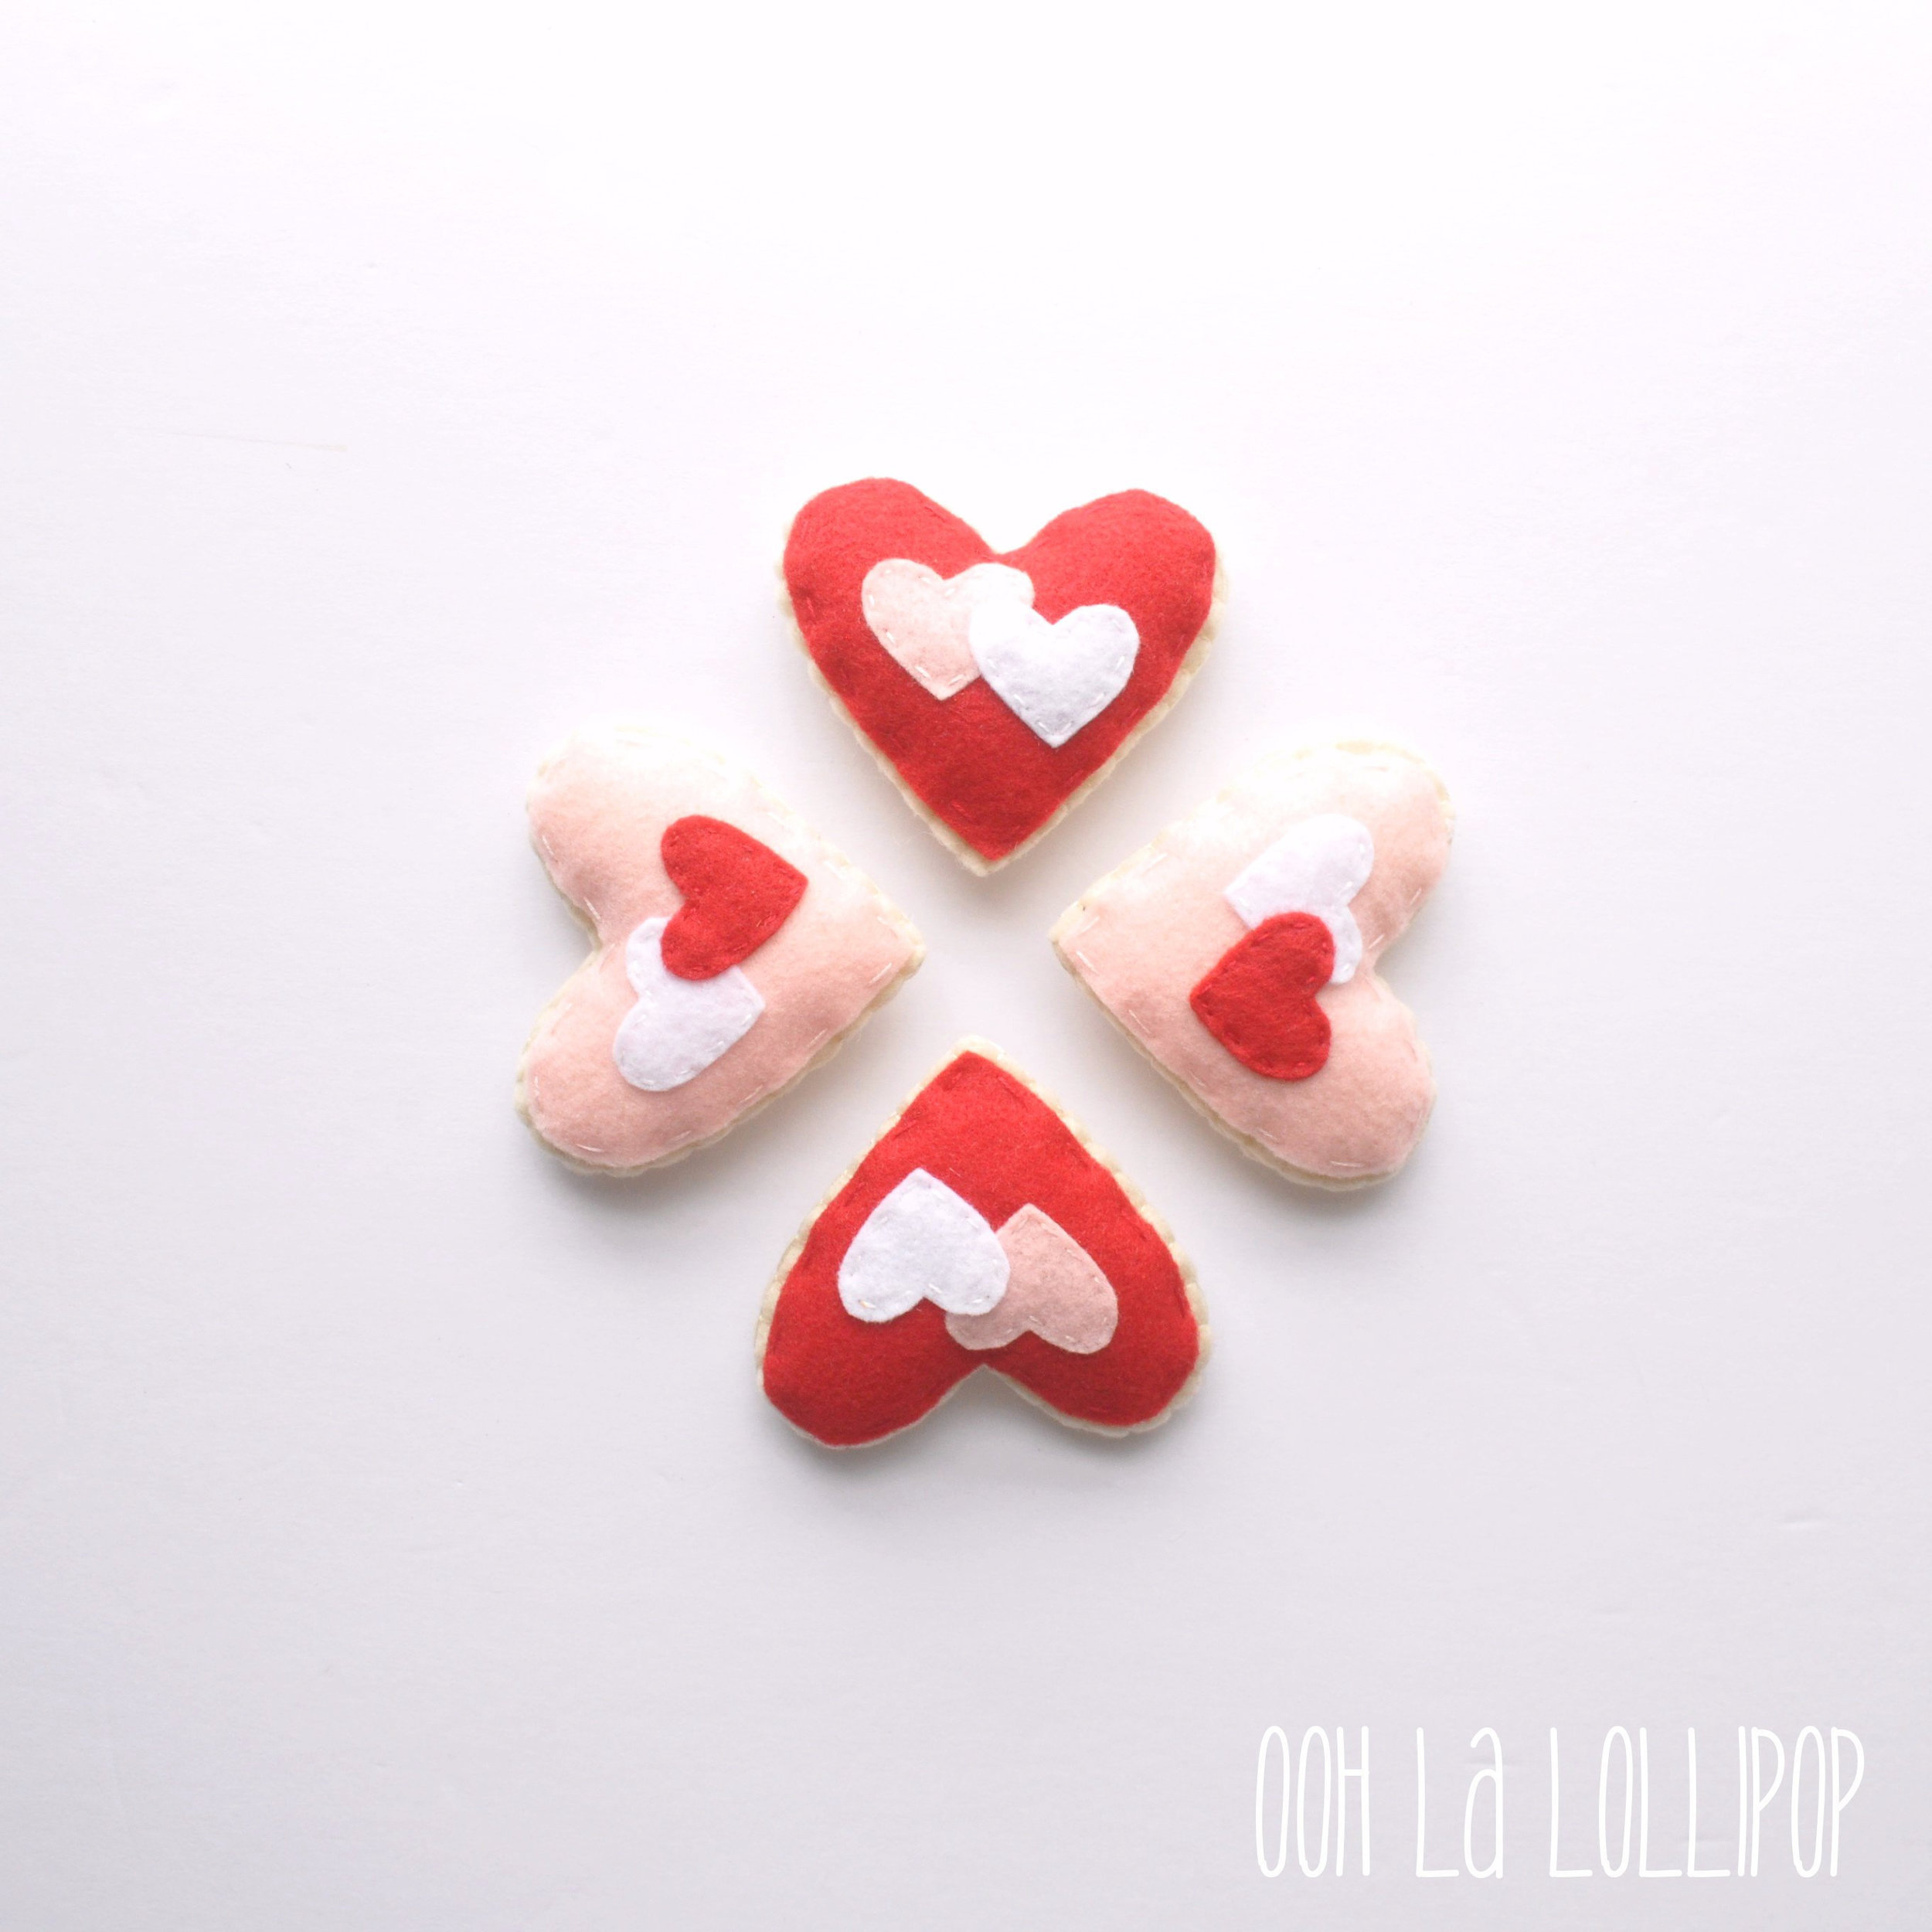 Oohlalollipop Felt Heart-Shaped Cookies, $14-.jpg